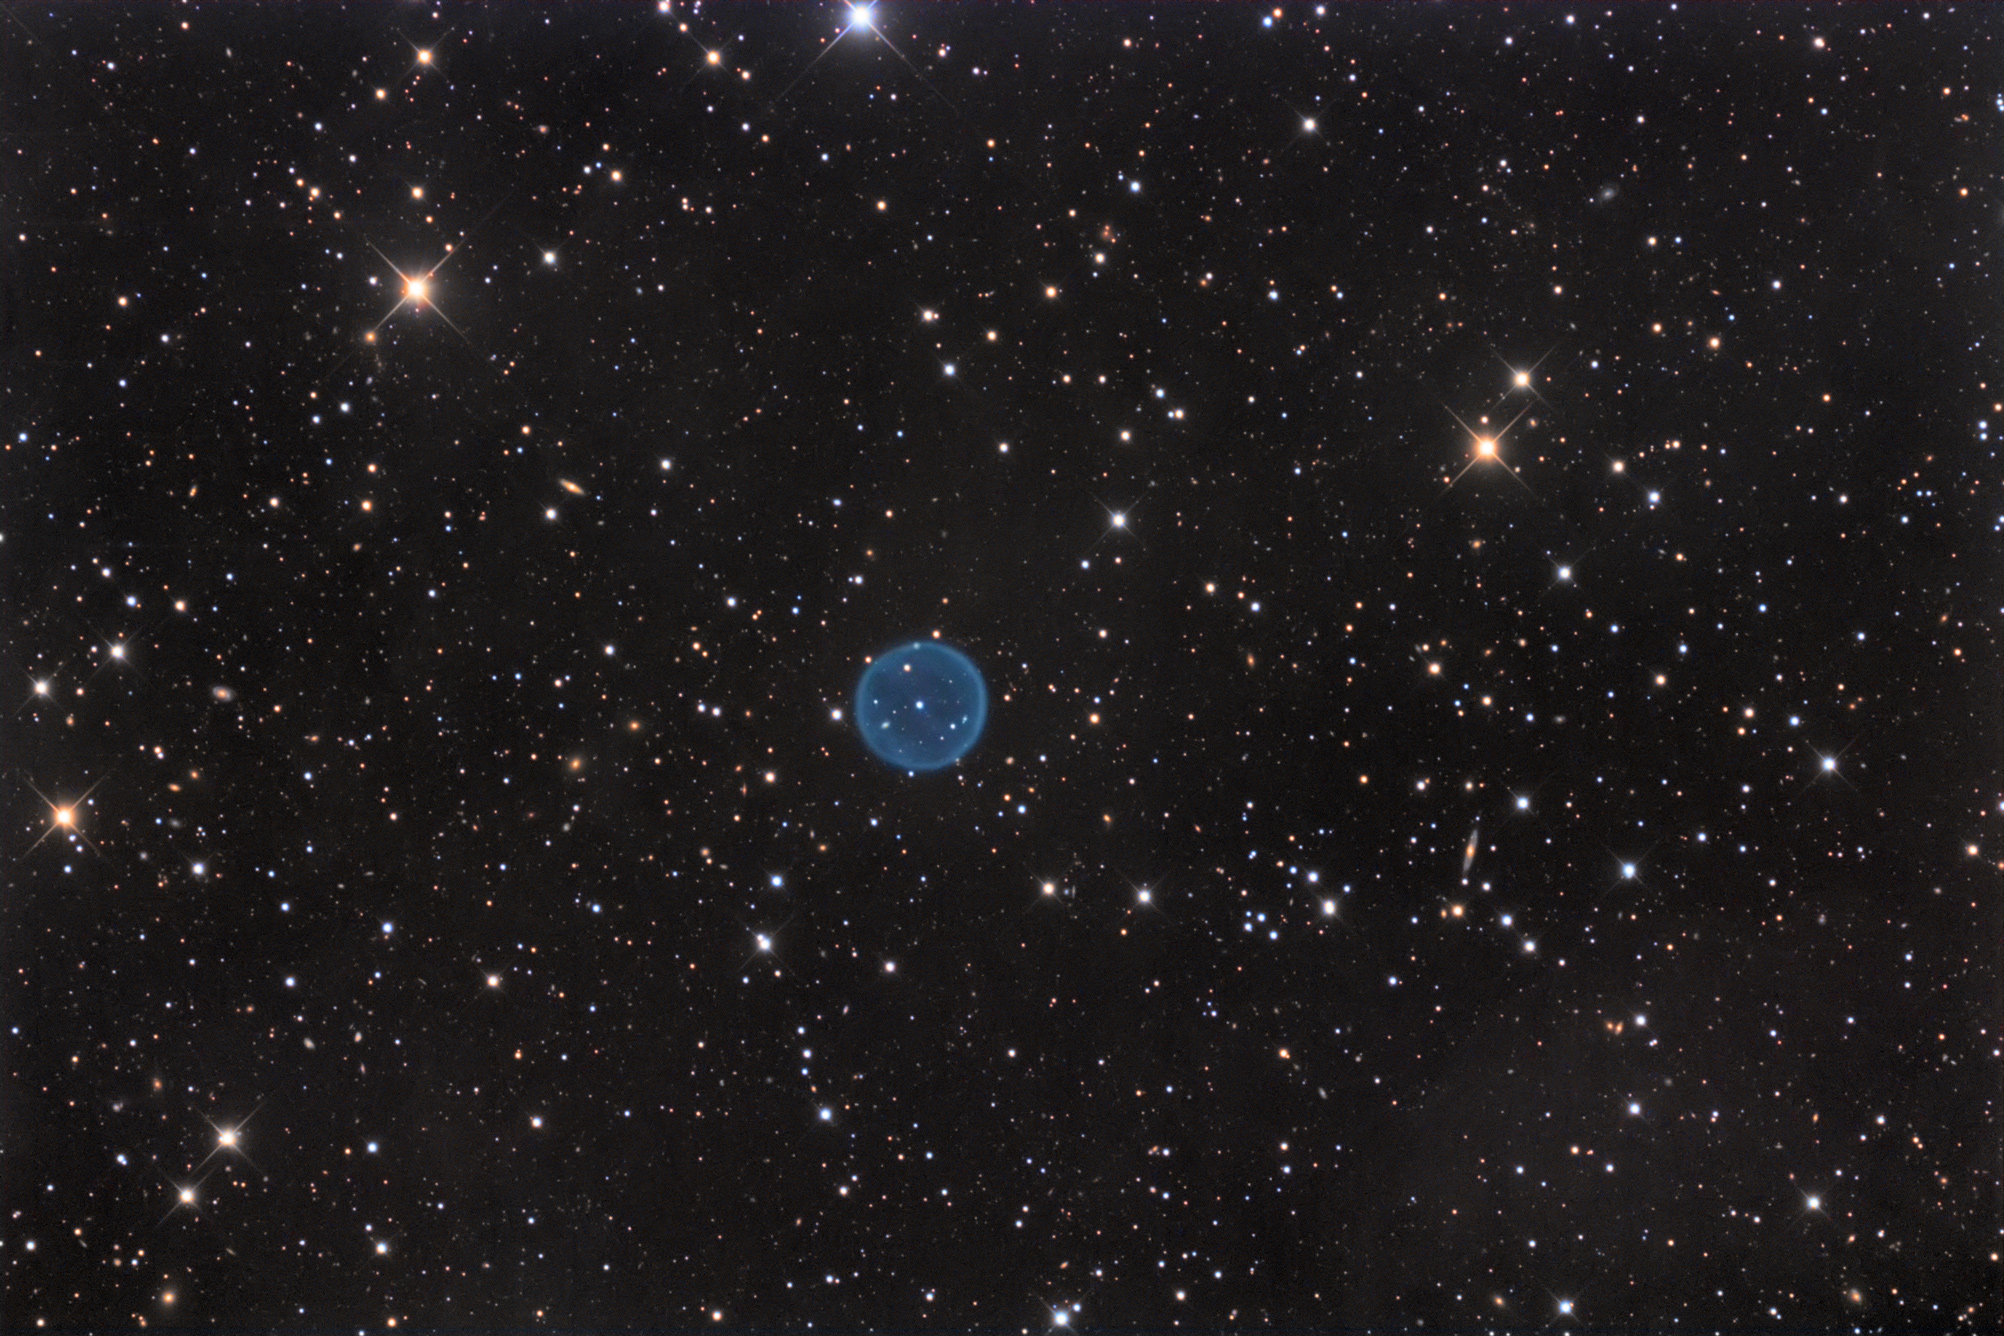 Planetary Nebula Glows Like a Blue Space Bubble in Amazing Photo